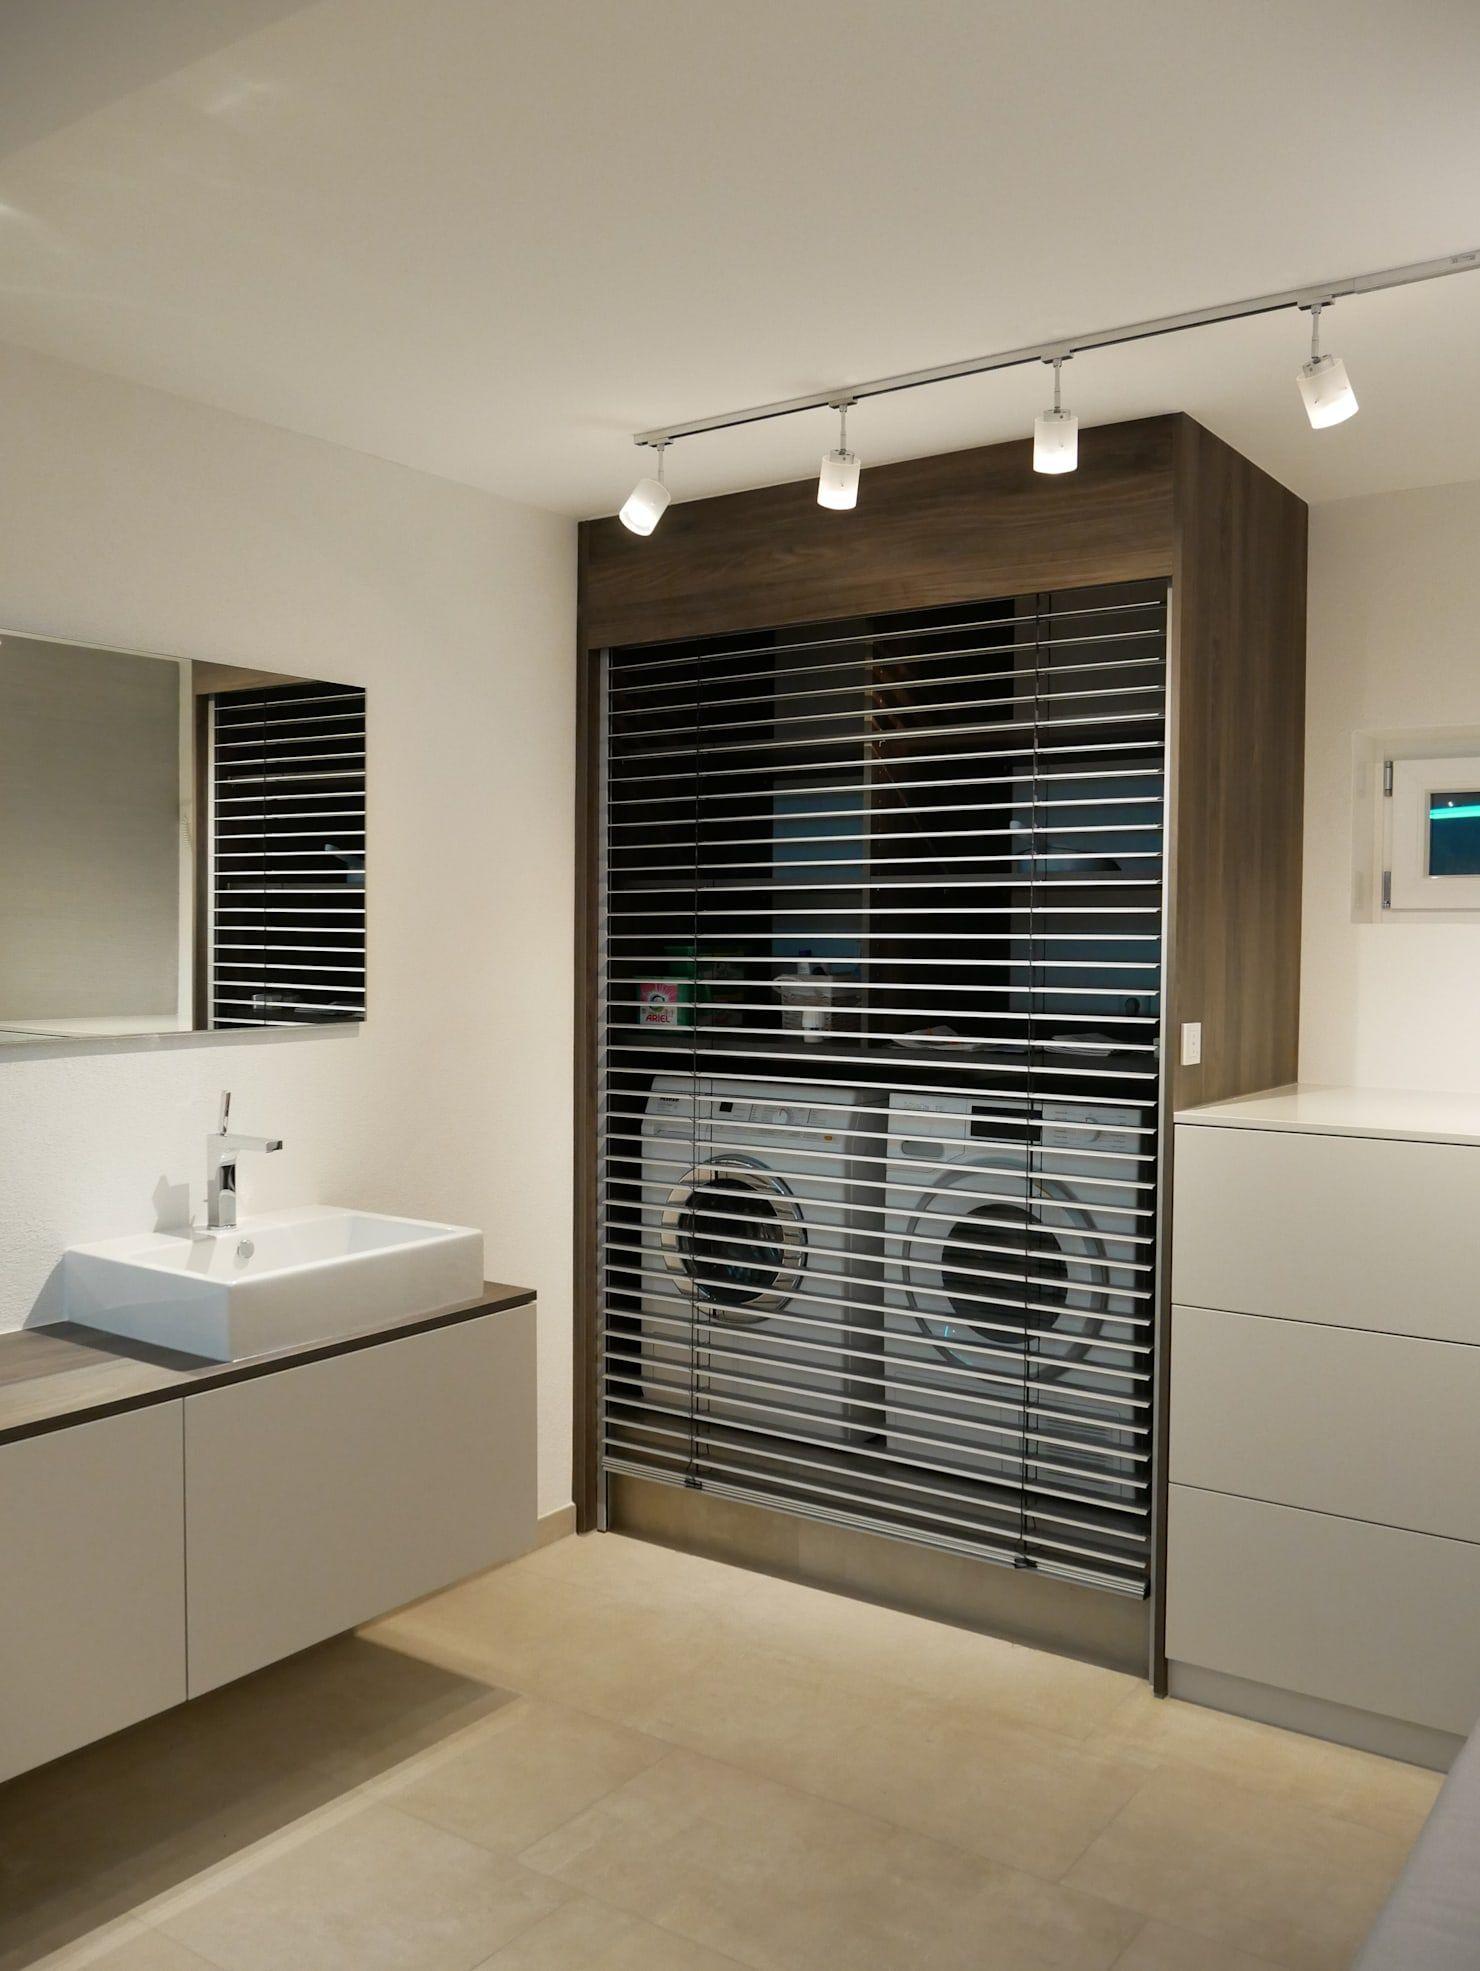 Wellnessbad Mit Dampfdusche Skandinavische Badezimmer Von As Designconcepte Skandinavisch Hom In 2020 Bathroom Inspiration Modern Beautiful Bathrooms Bathroom Colors